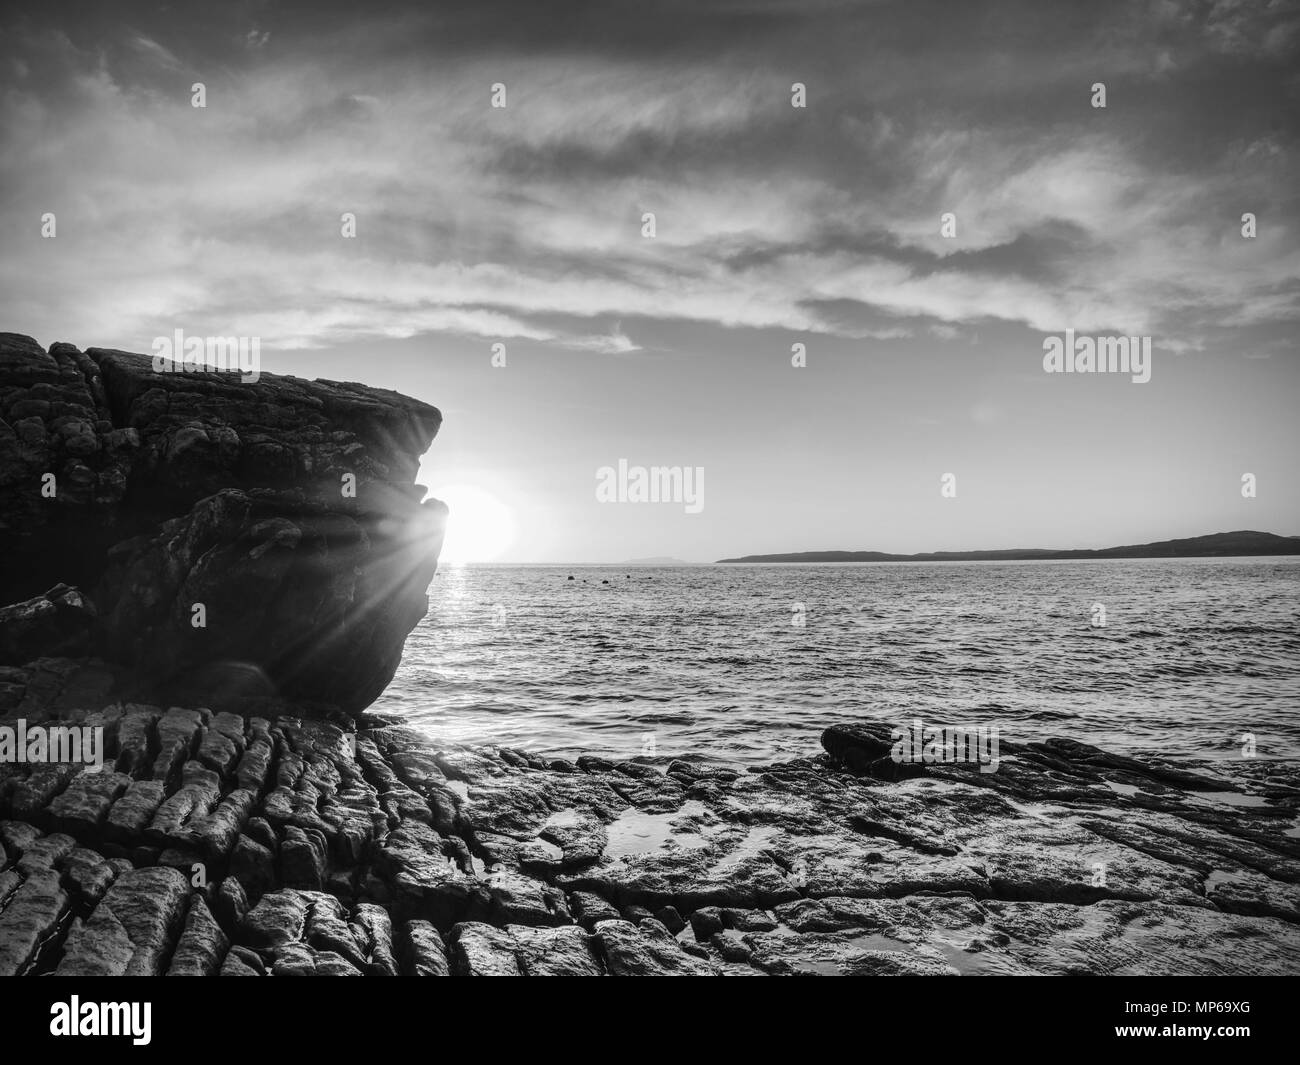 Rocks near Elgol,  Loch Scavaig,  Isle of Skye Scotland. Warm sunset colors in cold February evening. Popular photographers destination. - Stock Image